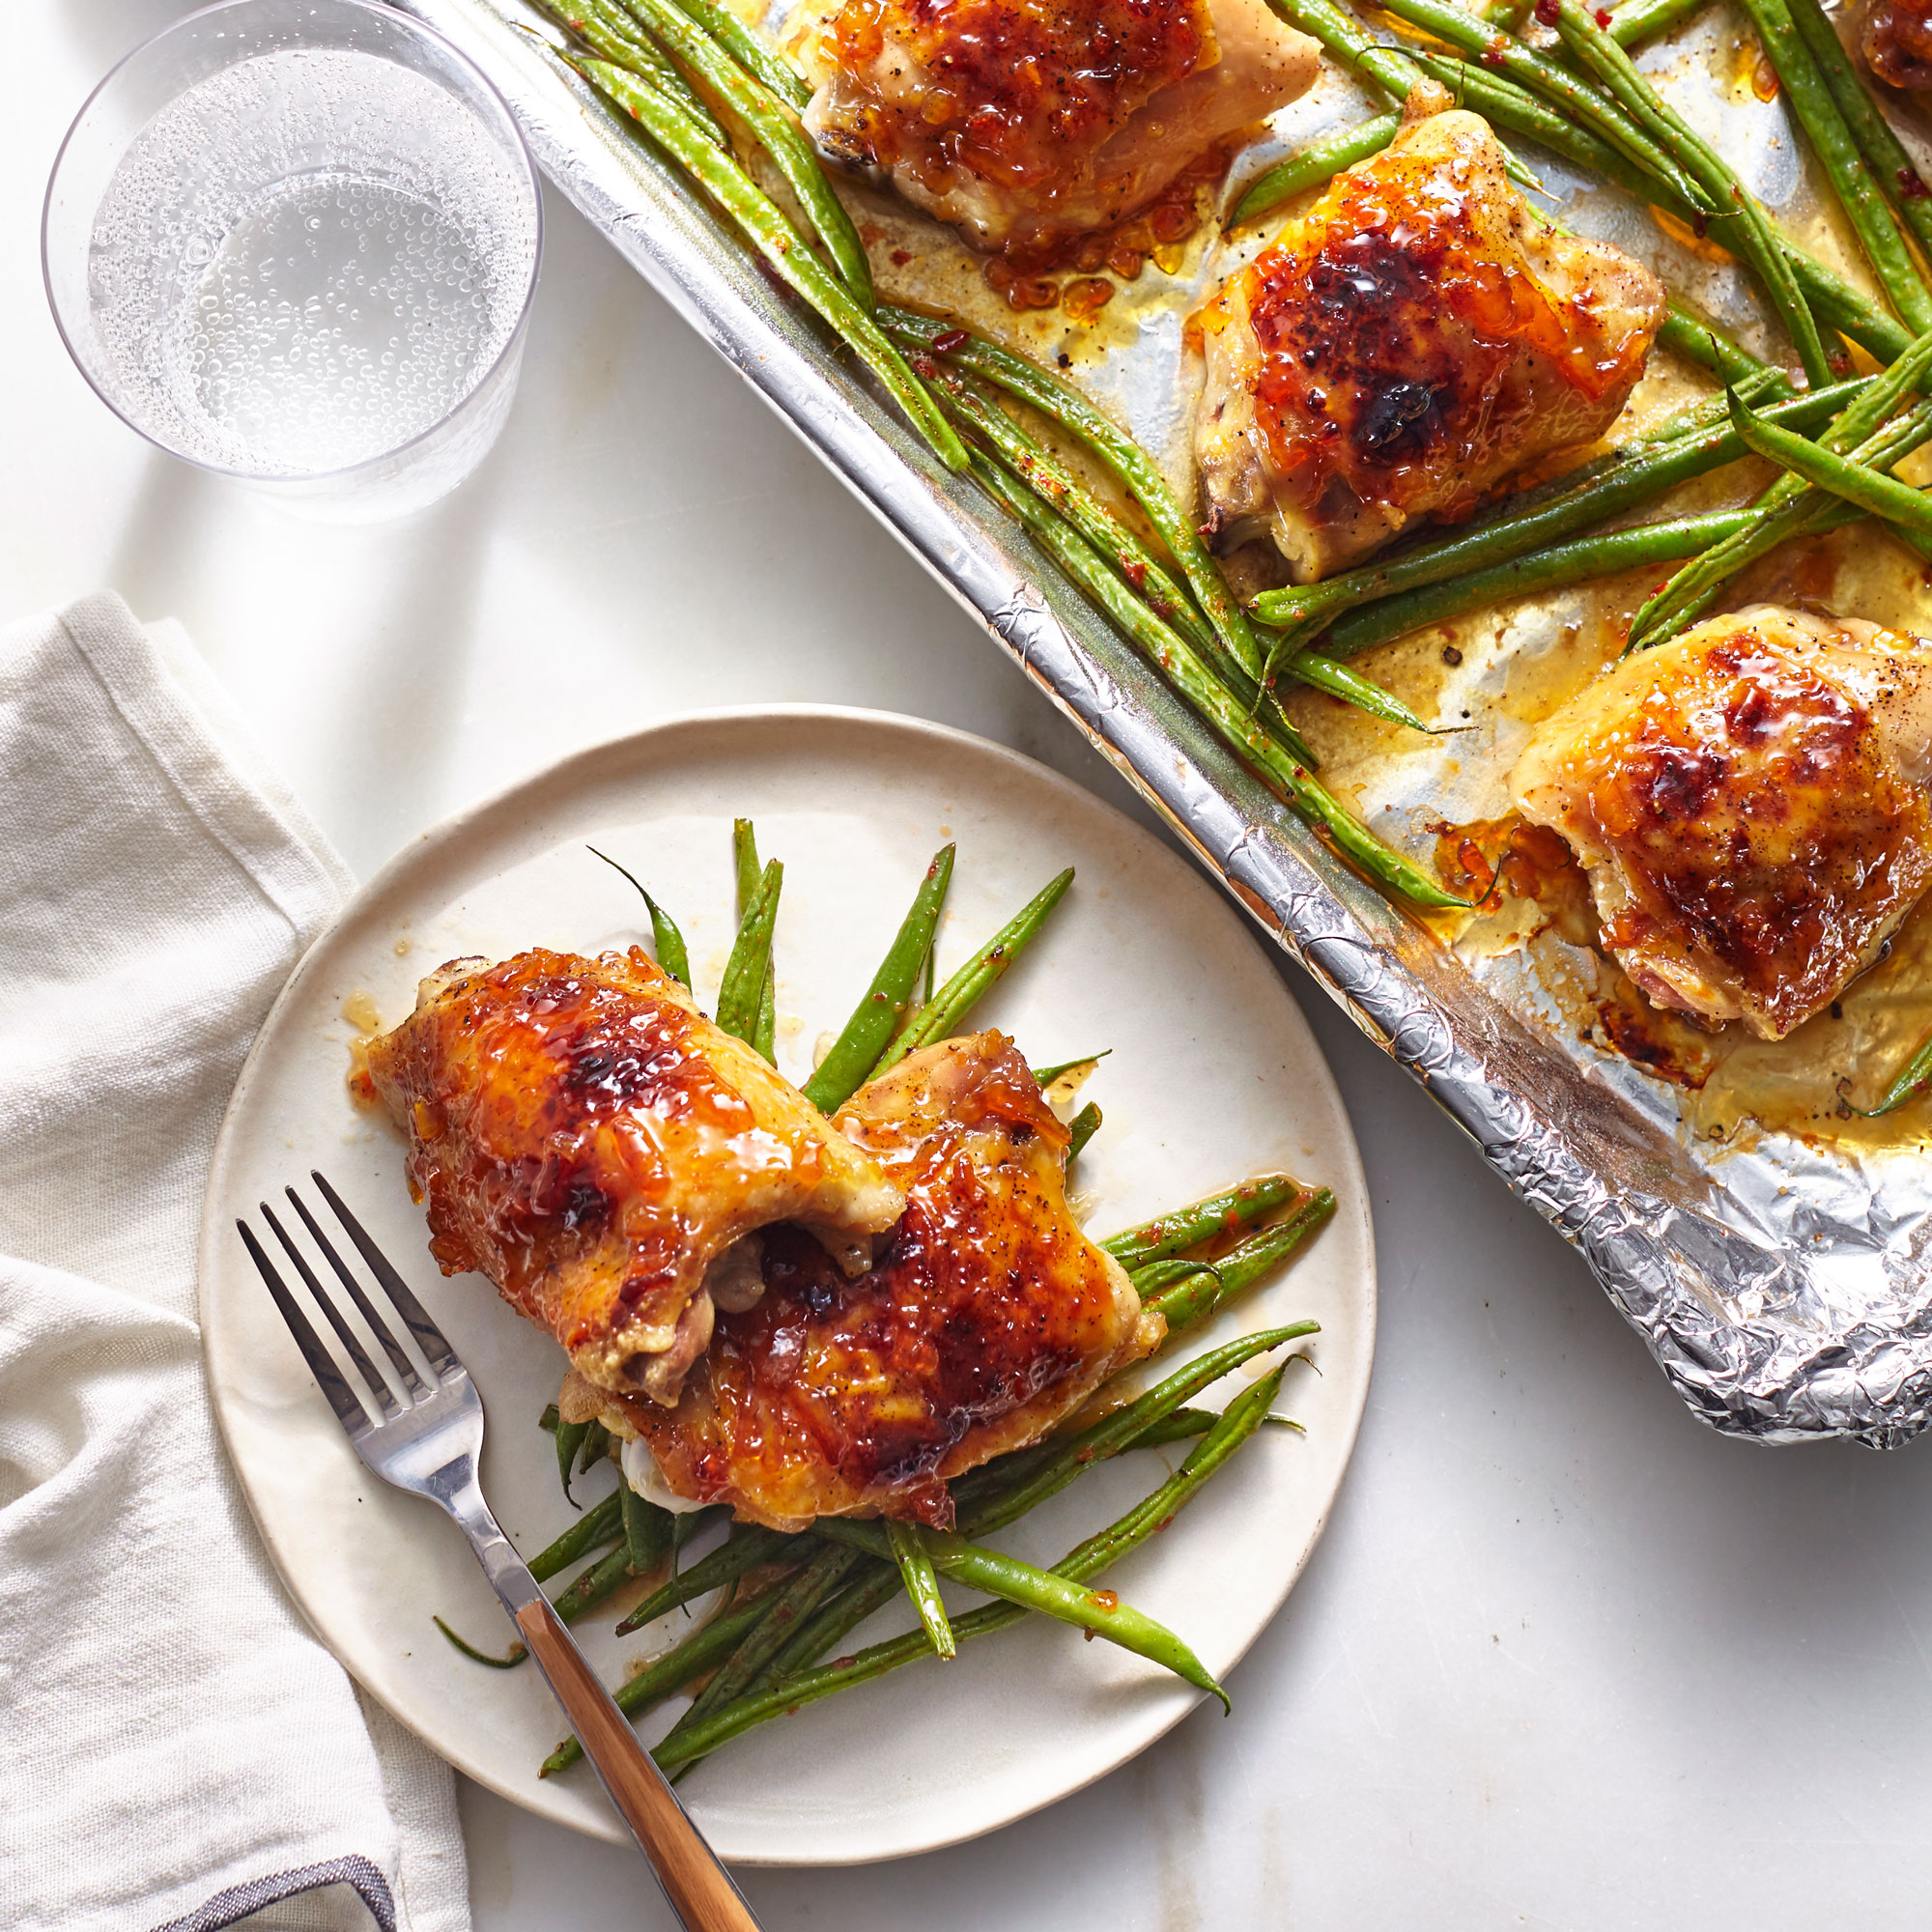 Sheet pan orange chicken with garlicky green beans recipe myrecipes forumfinder Images